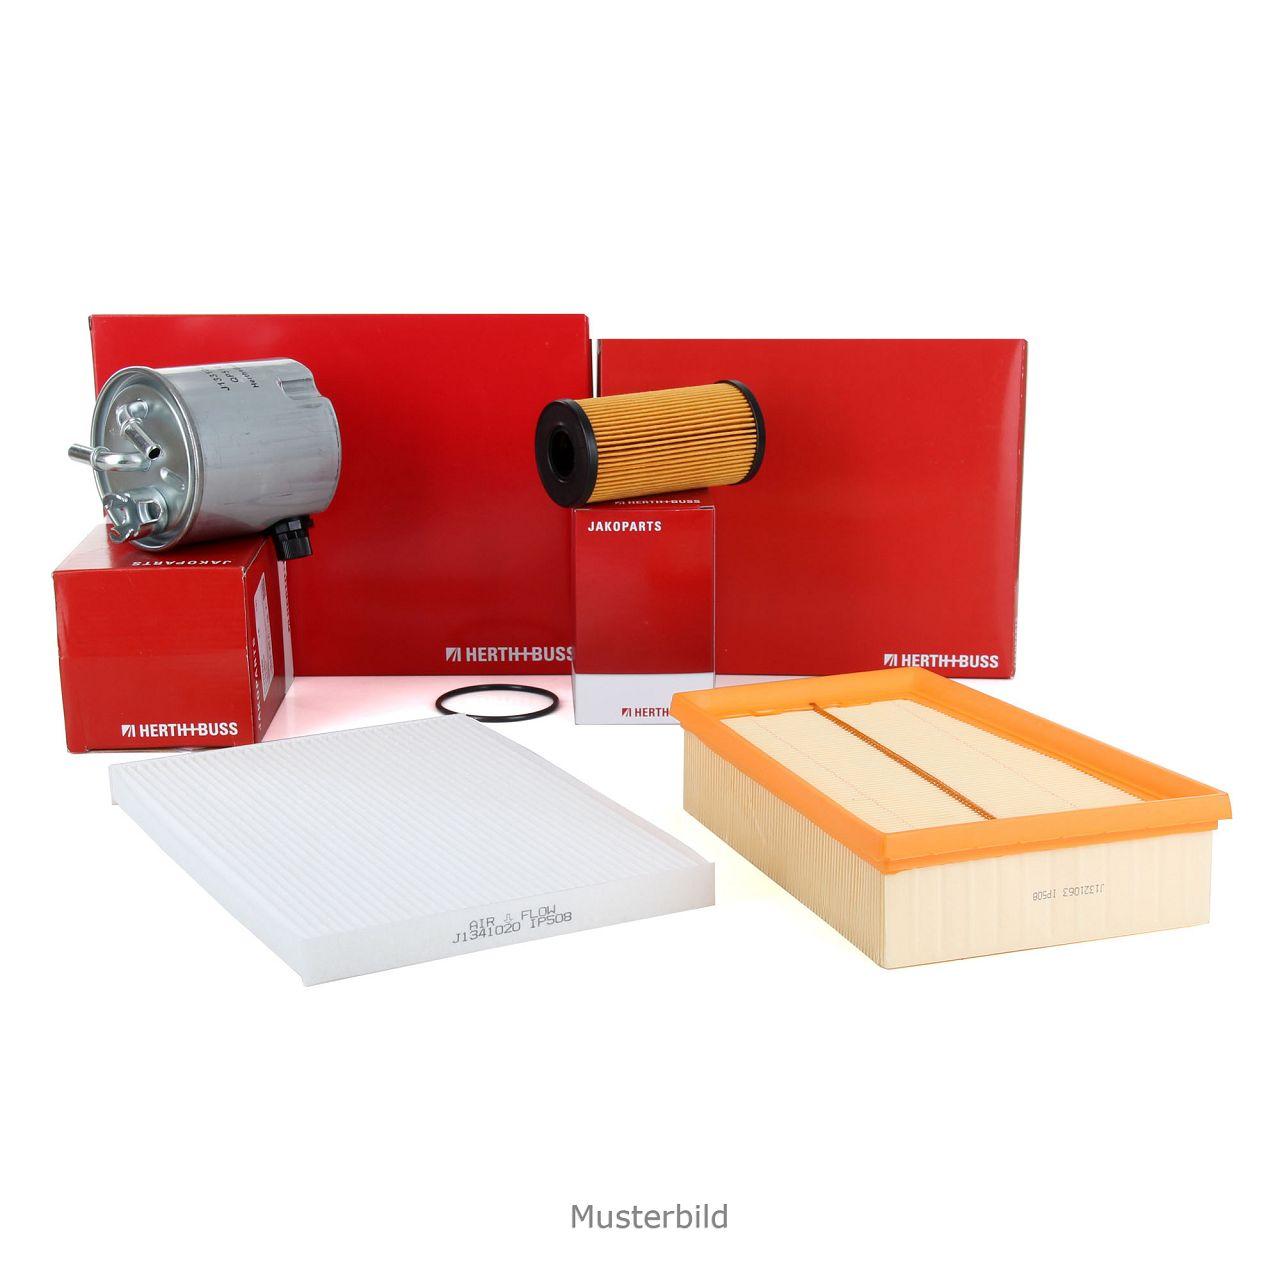 HERTH+BUSS JAKOPARTS Filterpaket Filterset für KIA SORENTO I JC 2.5 CRDi 163 PS